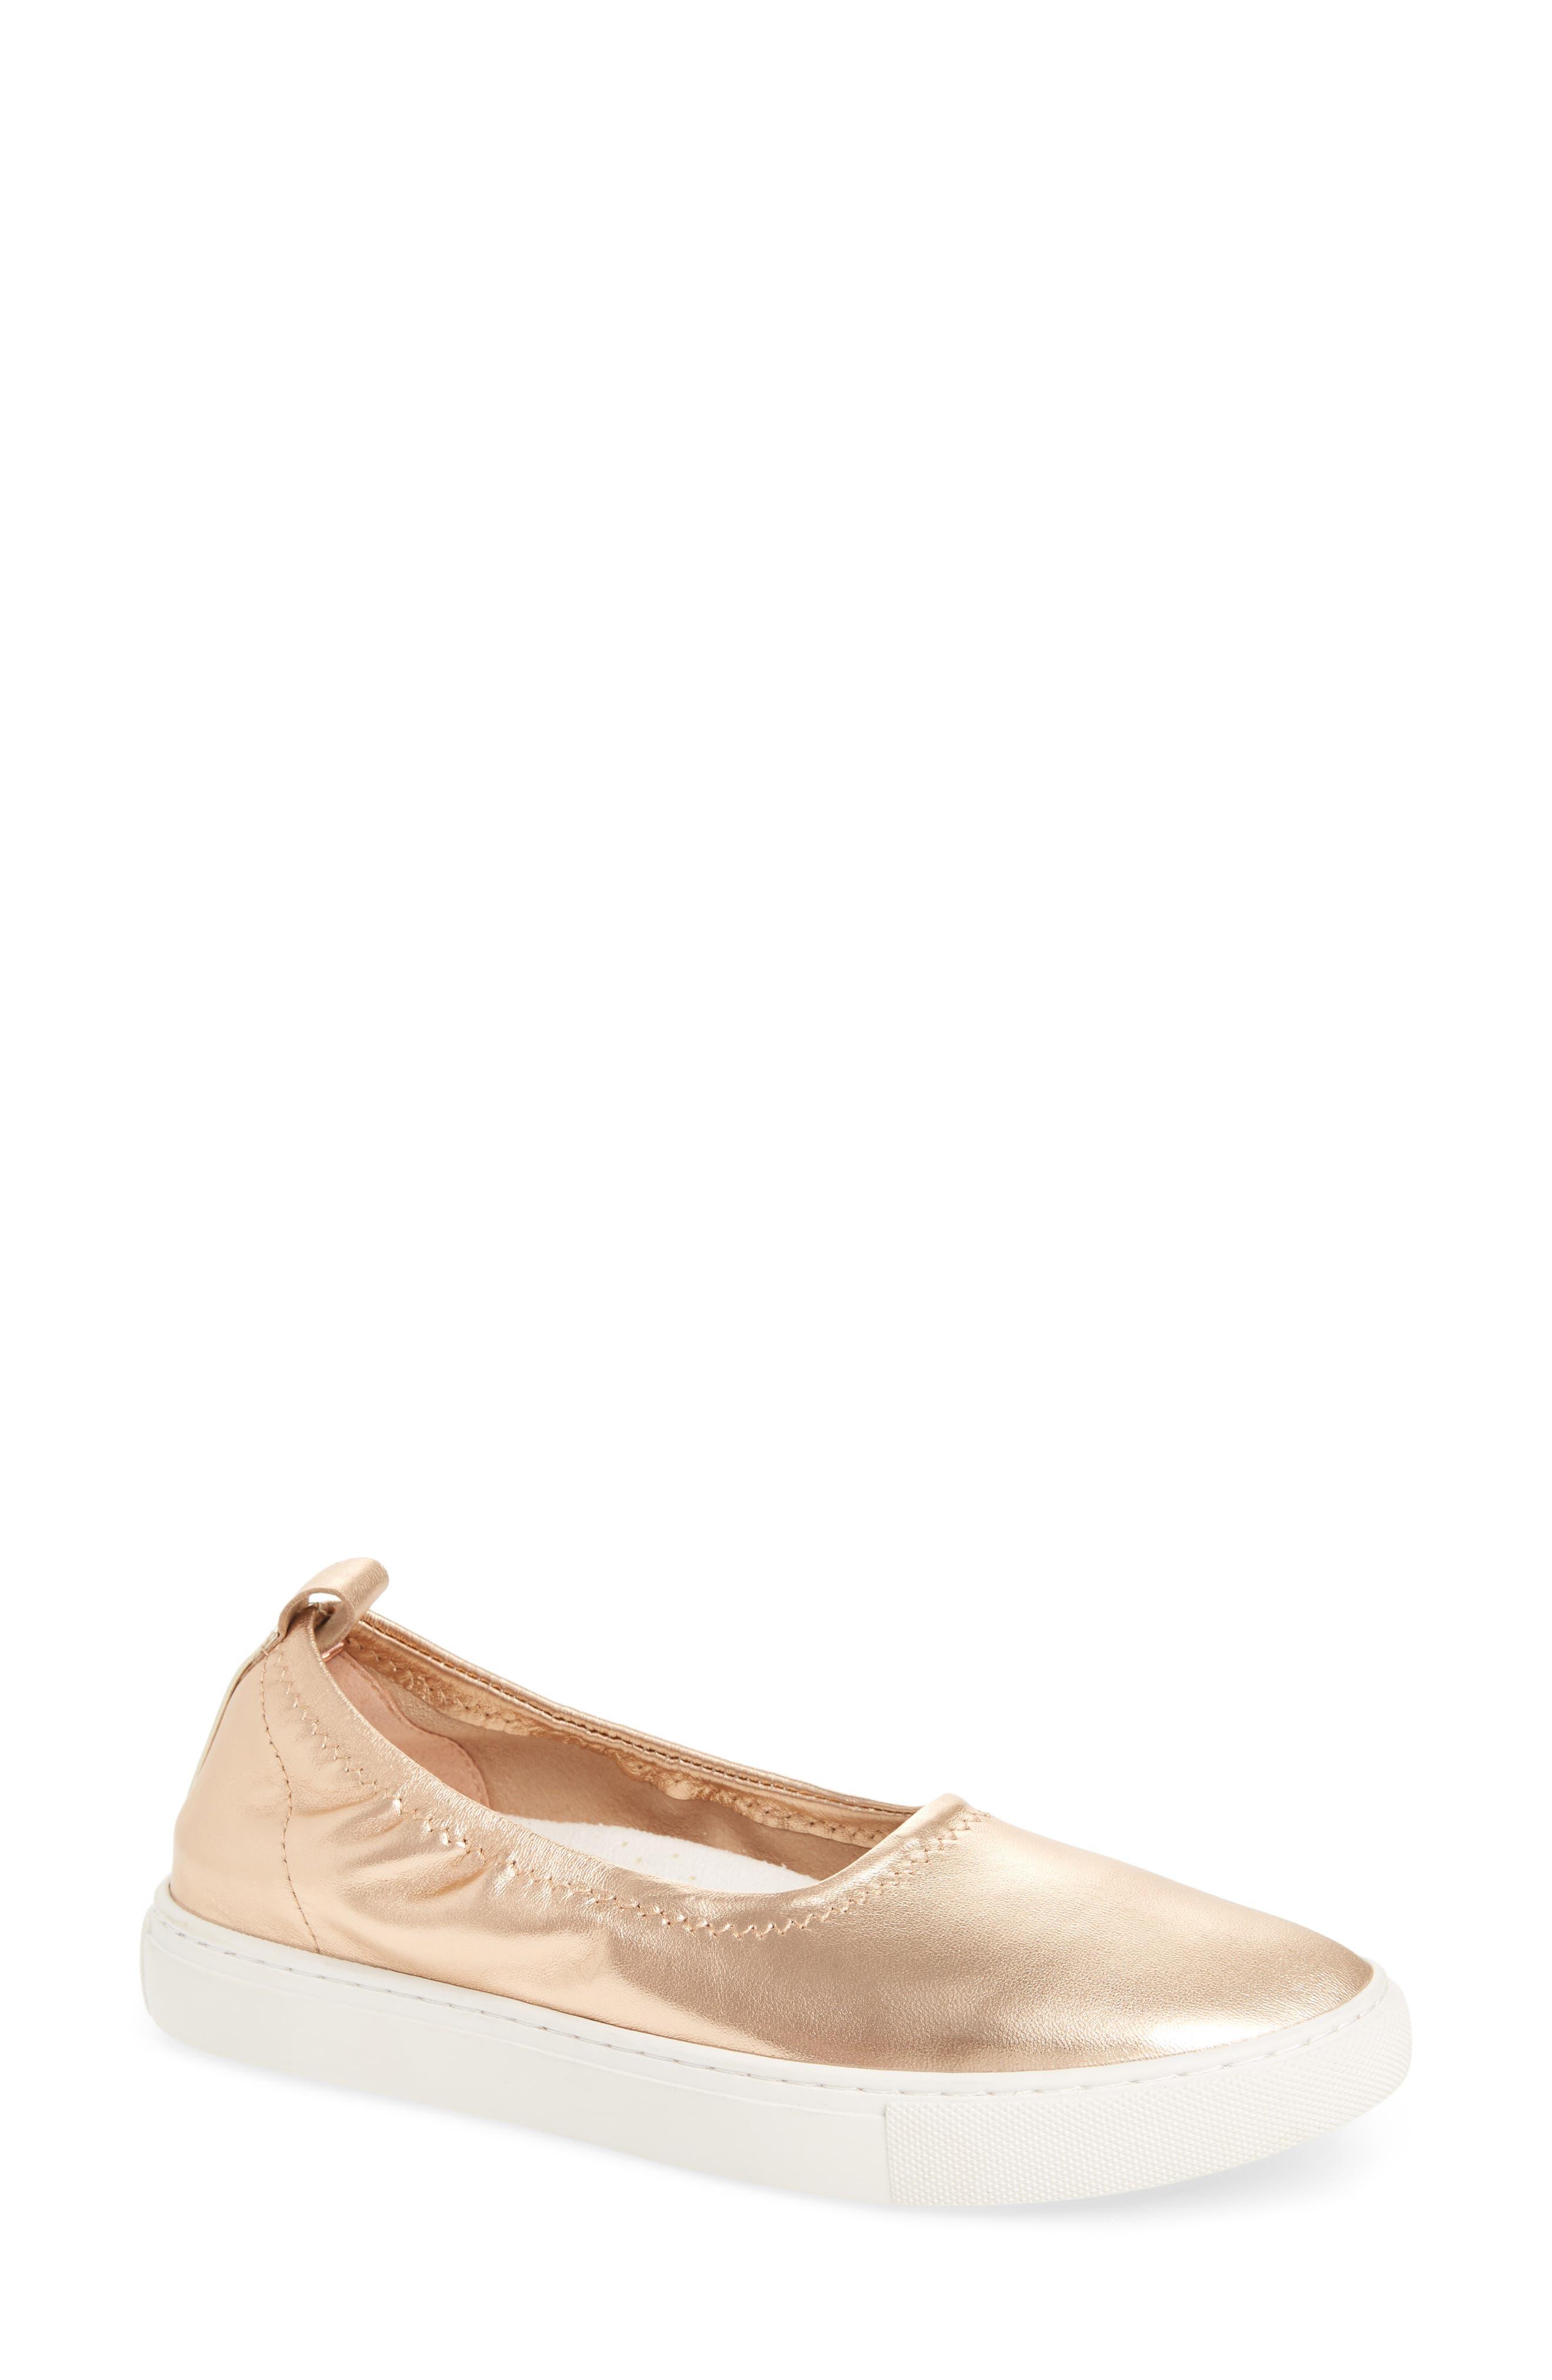 Kam Techni-Cole Ballet Flat,                         Main,                         color, Rose Gold Leather